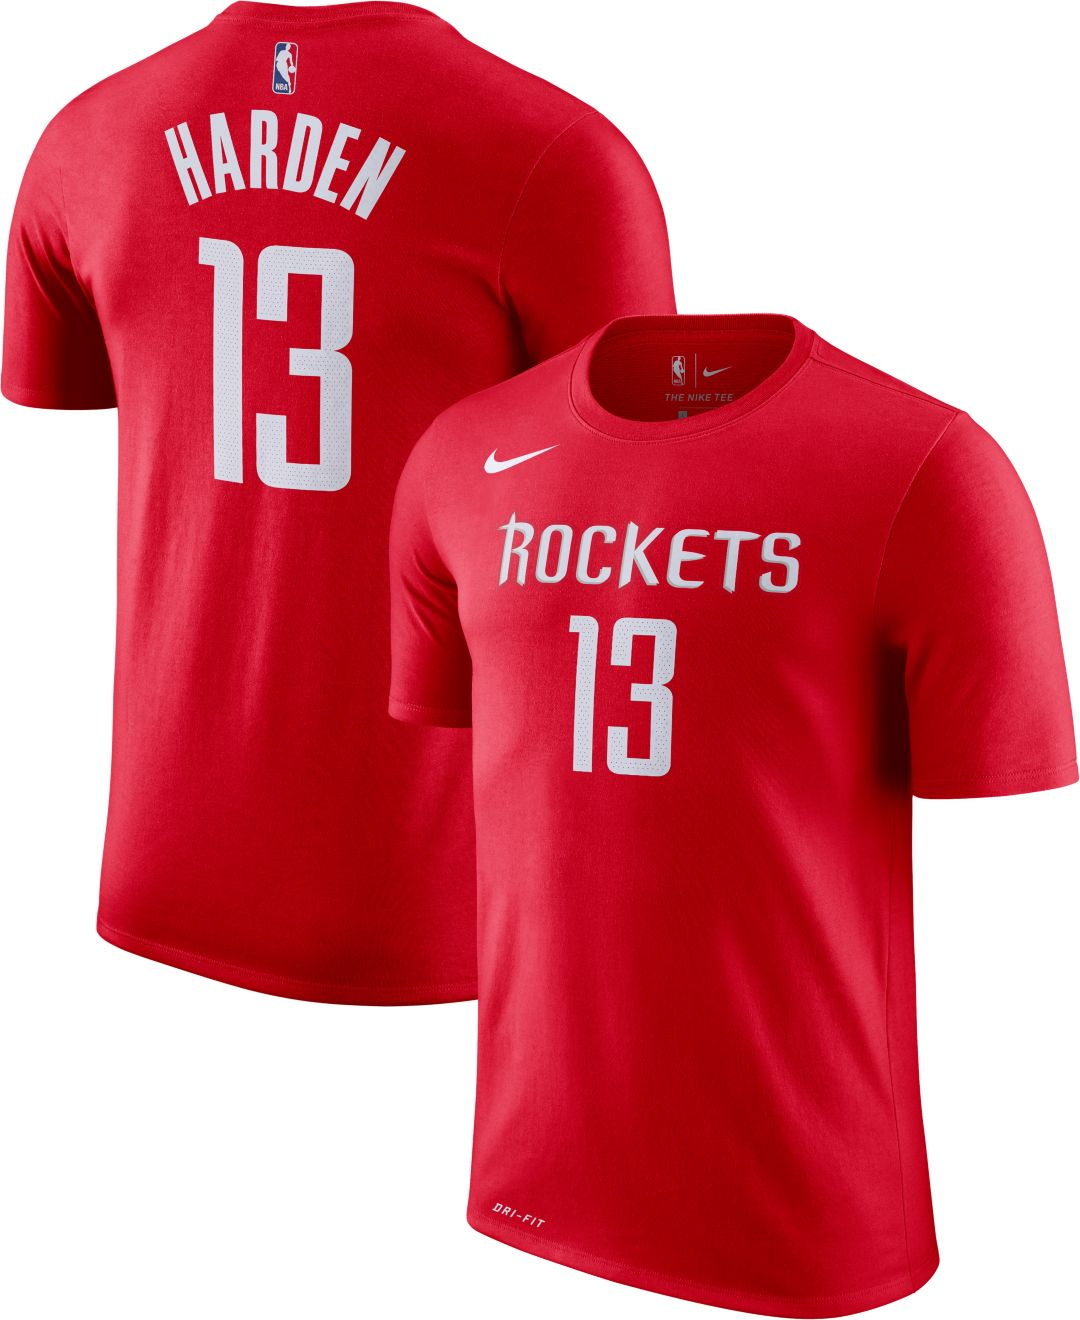 new styles 4531b 905fc Nike Men's Houston Rockets James Harden #13 Dri-FIT Red T-Shirt